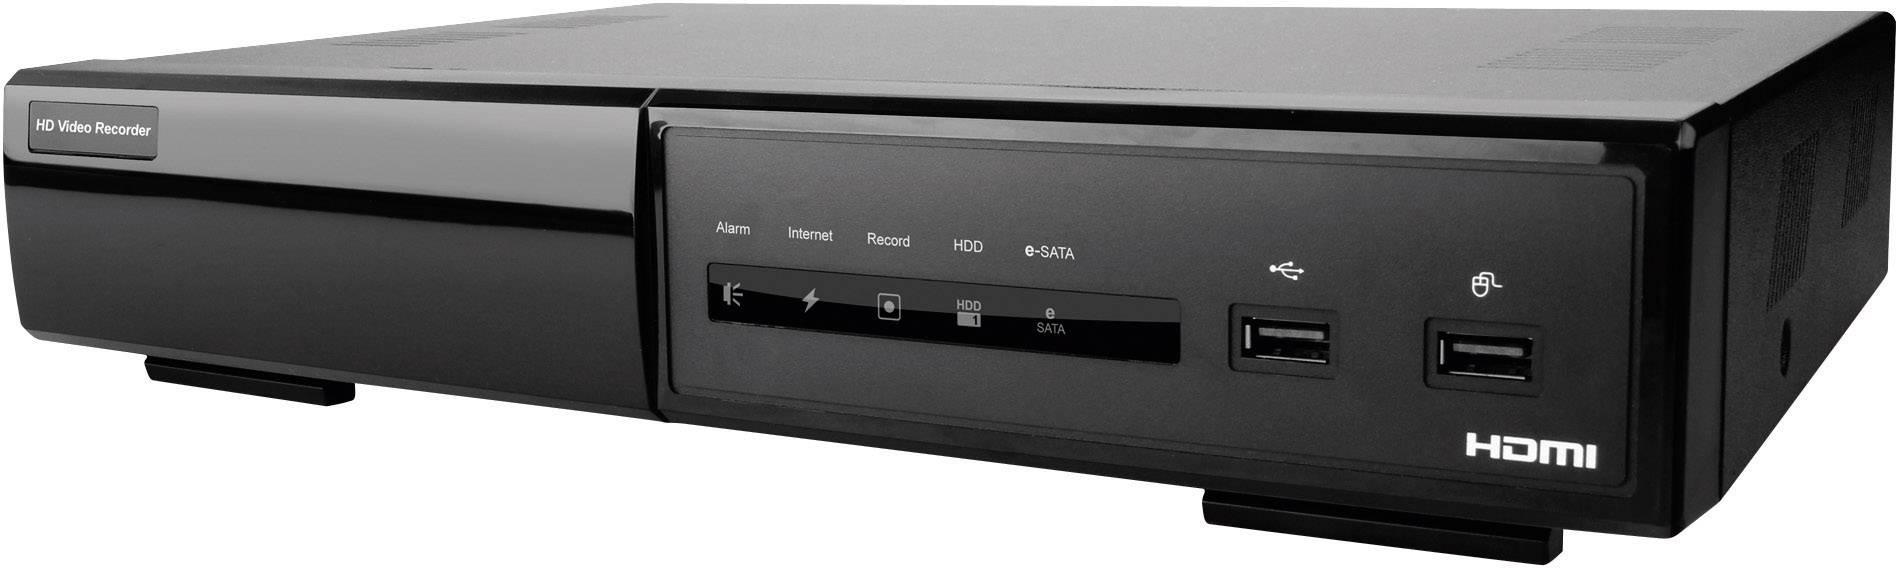 Síťový IP videorekordér (NVR) pro bezp. kamery Digitus Professional DN-16114, 4kanálový